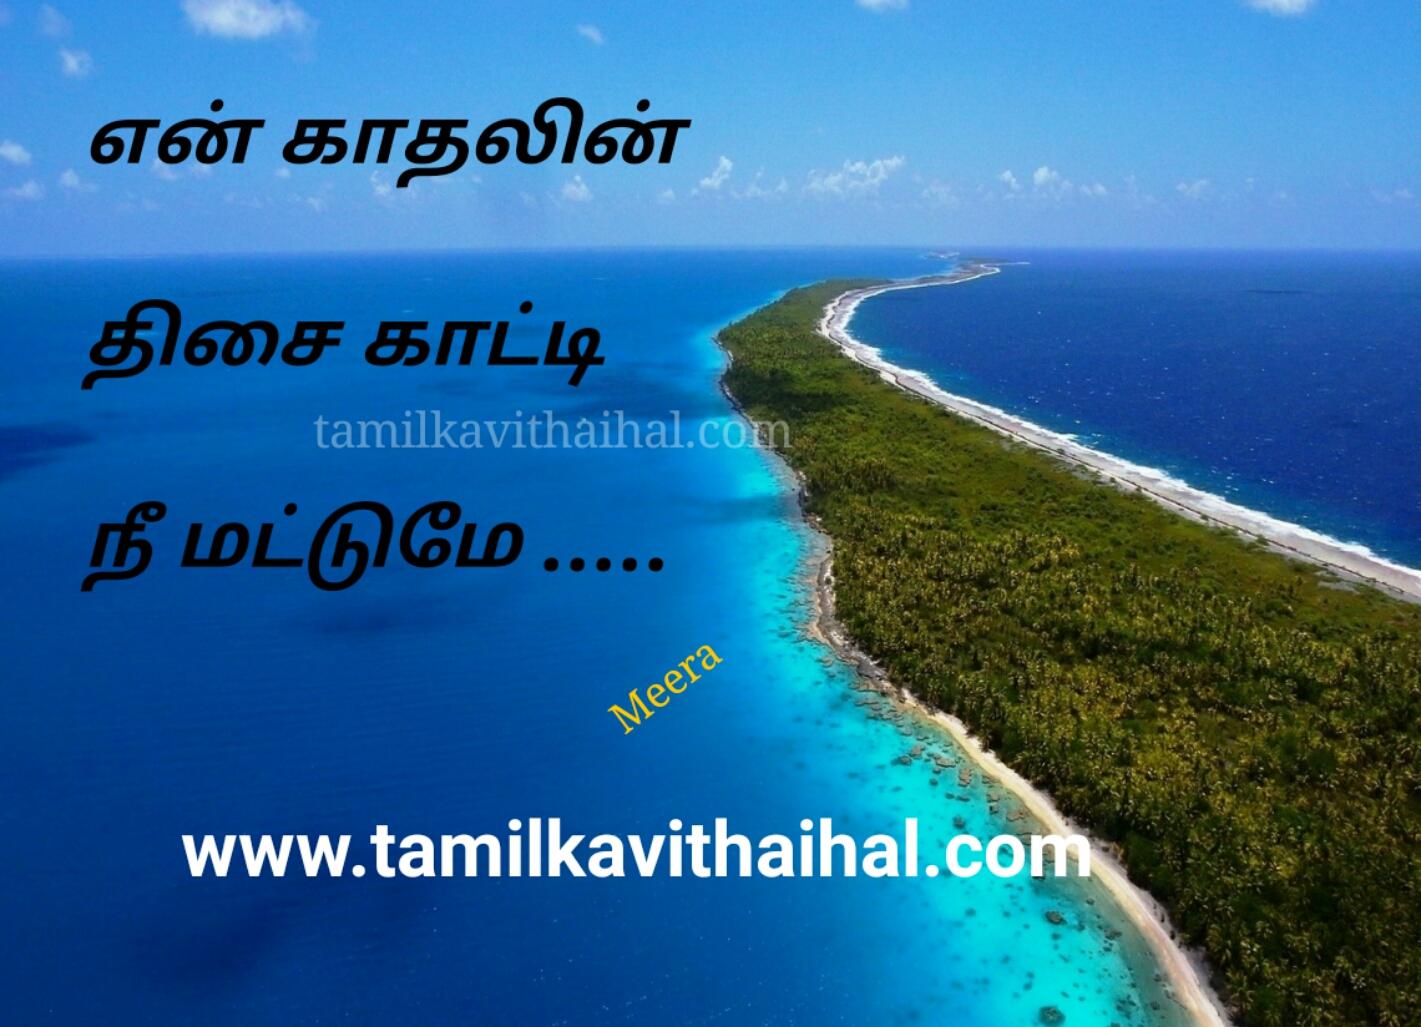 en kathalin thisai kaati nee matumae tamil kavithai HD